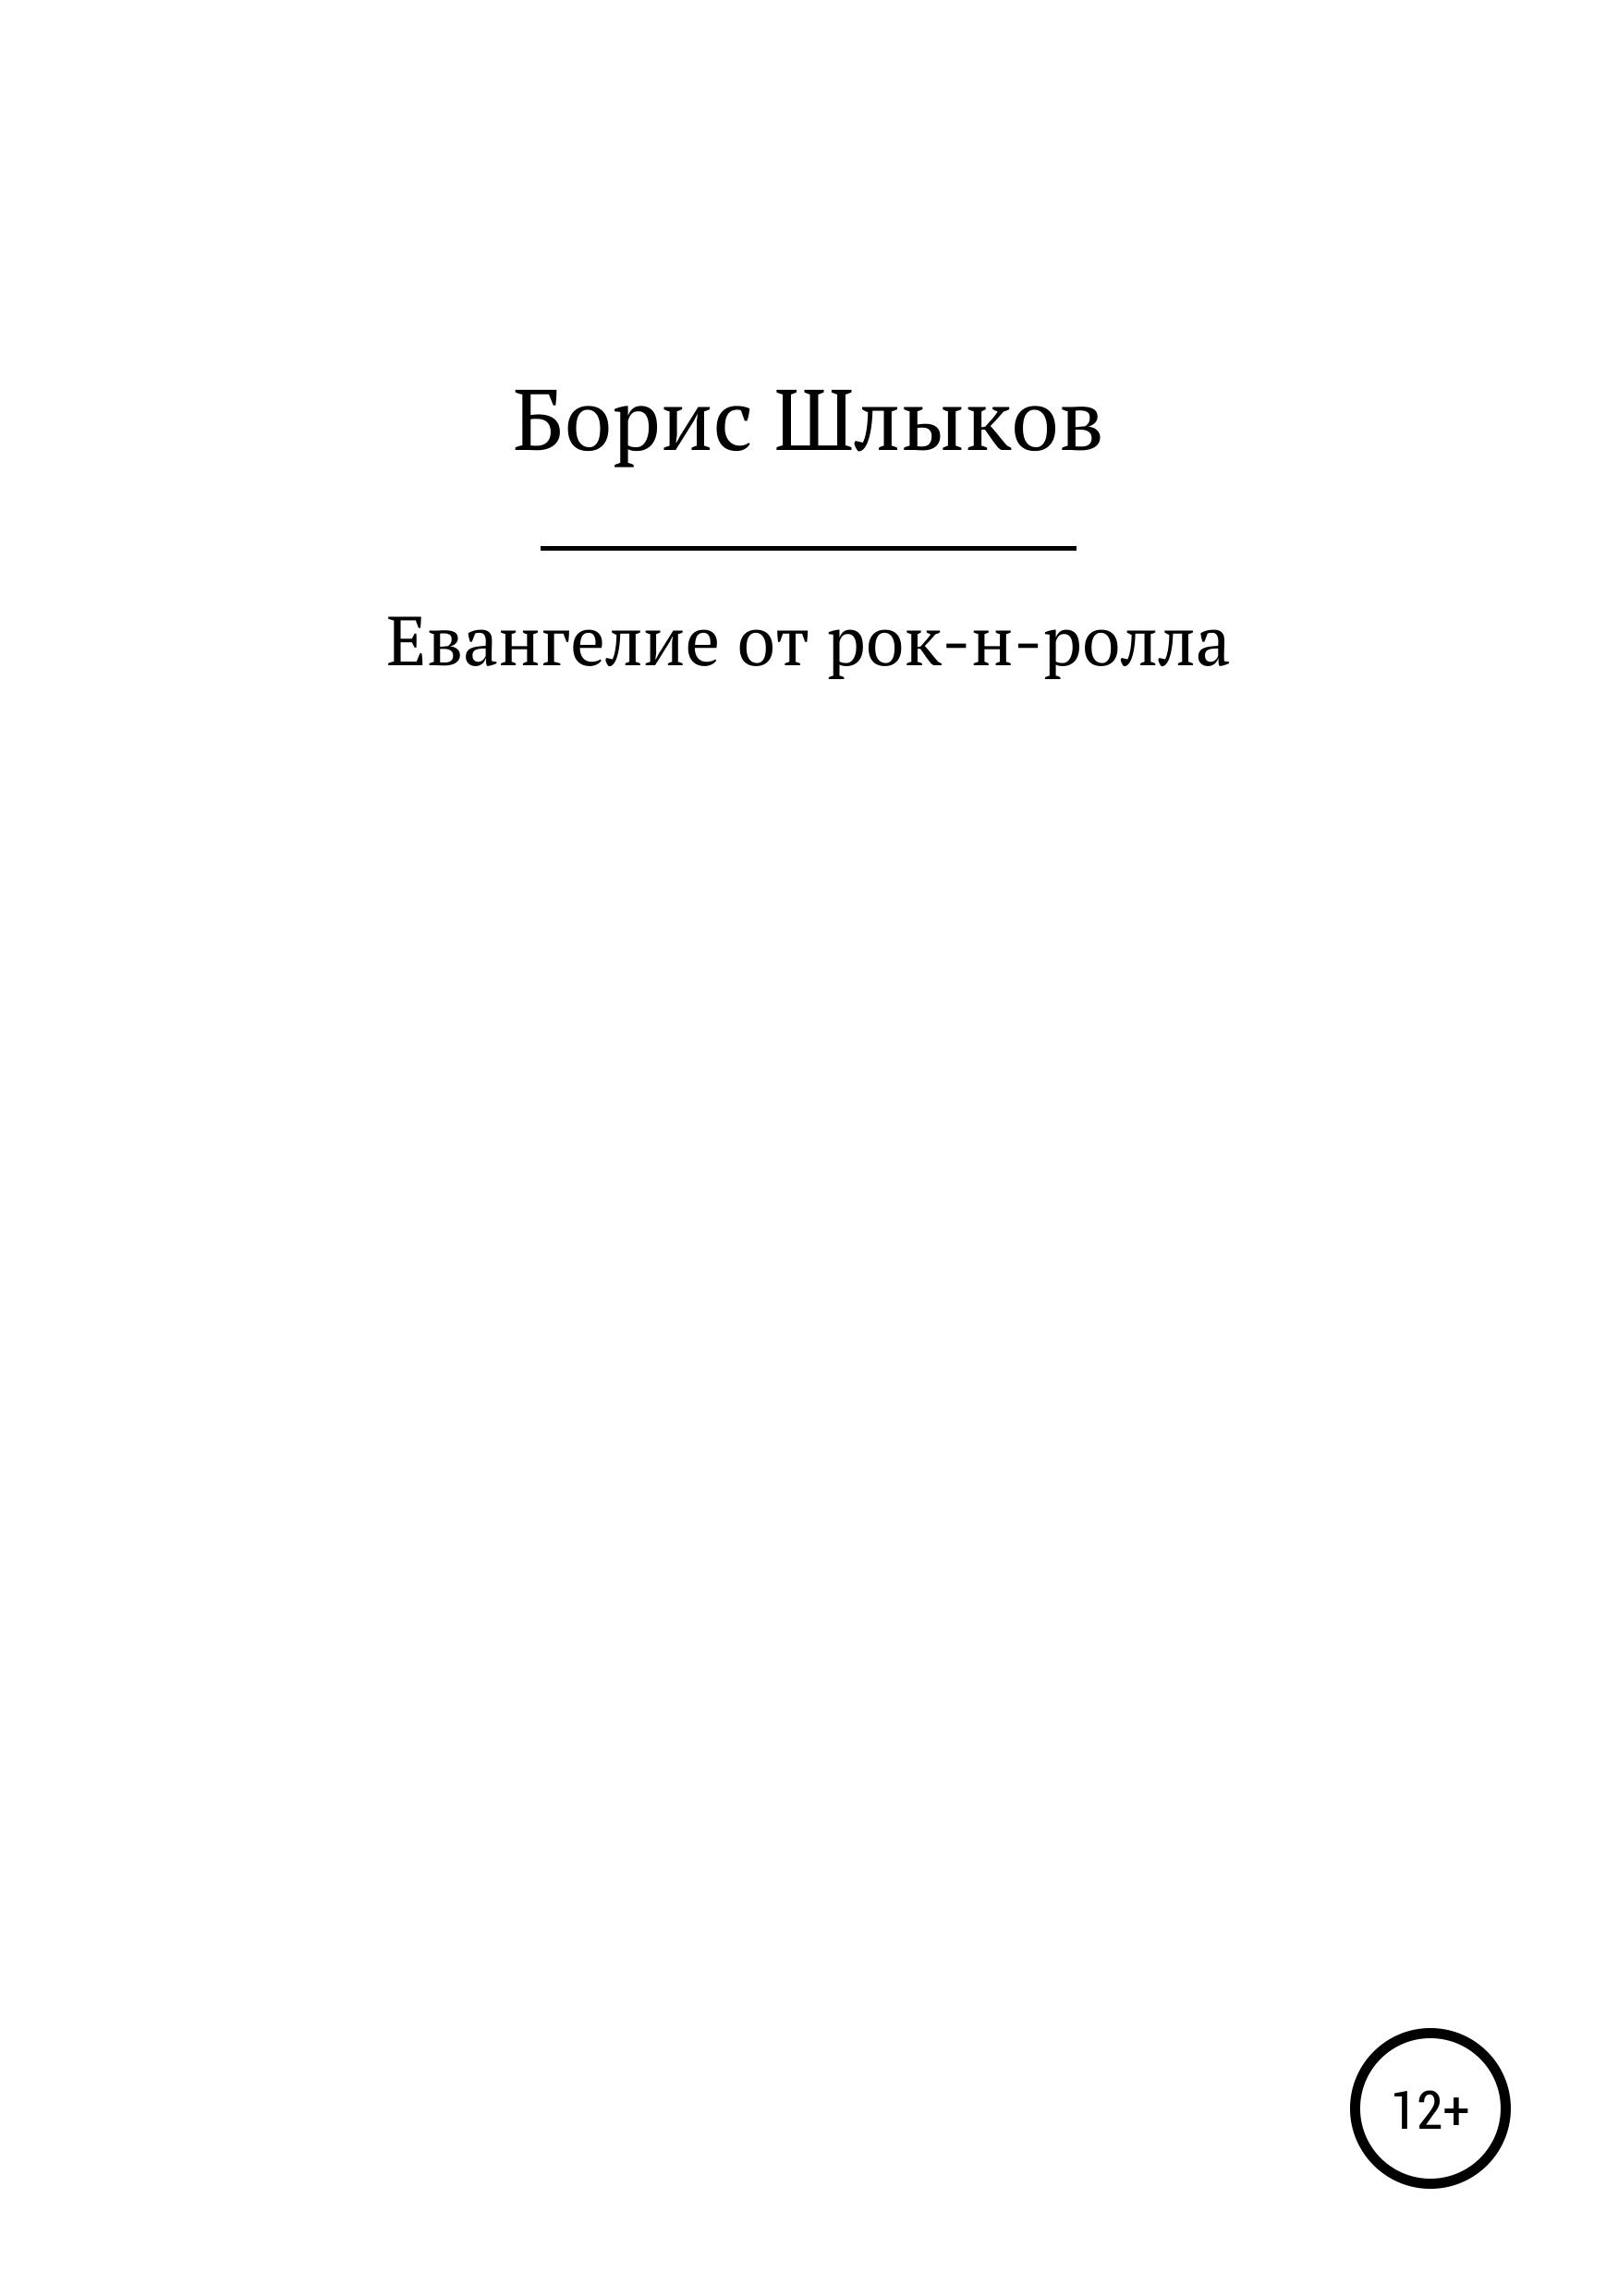 Борис Николаевич Шлыков Евангелие от рок-н-ролла цена